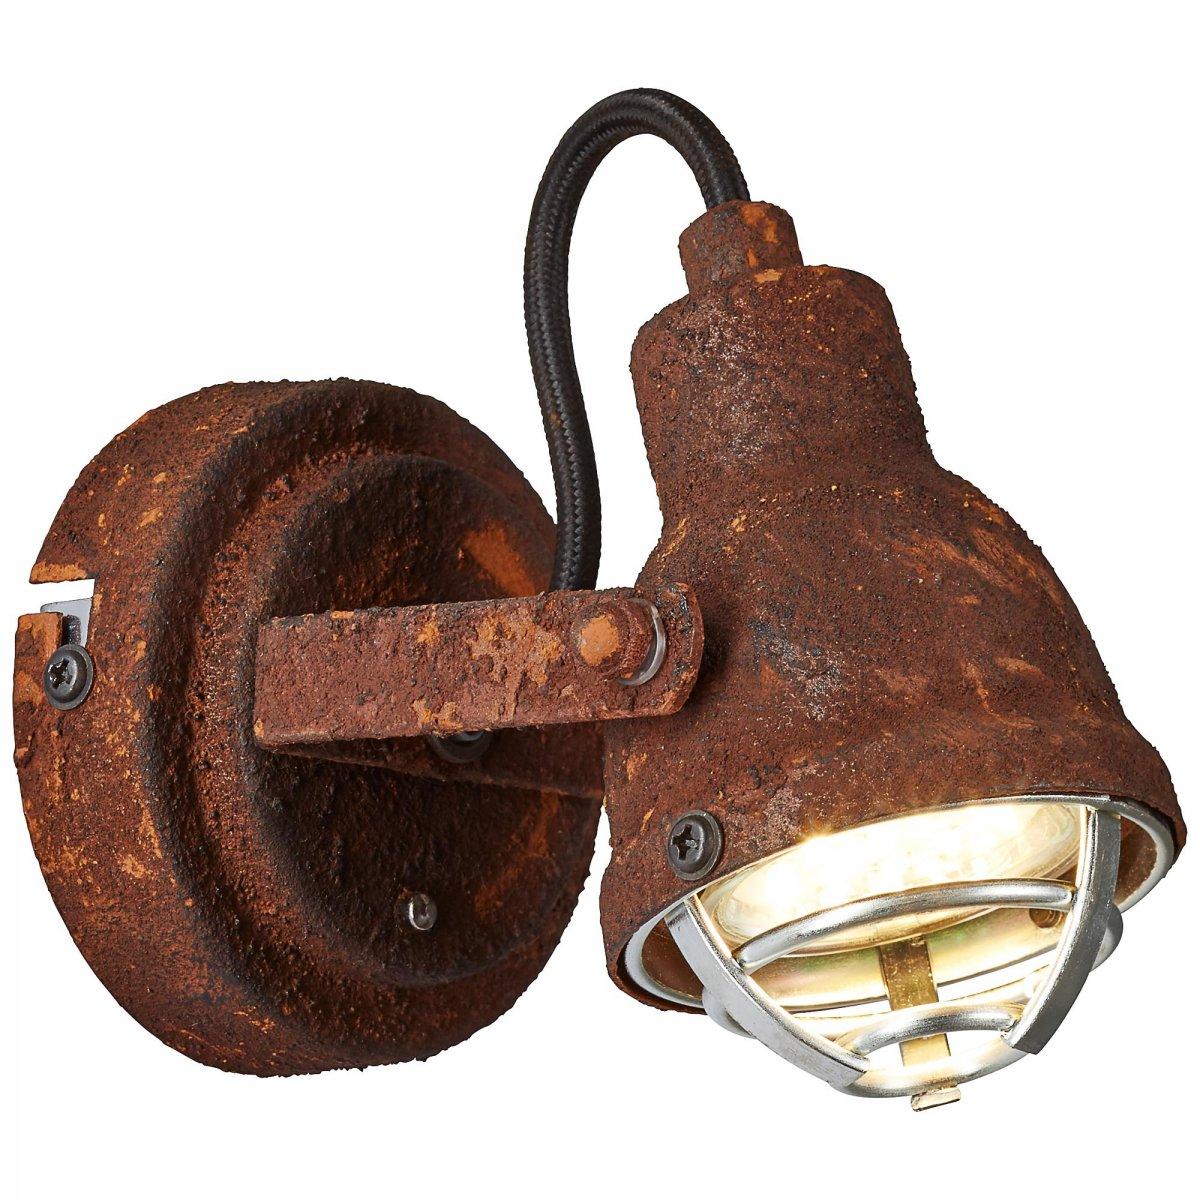 brilliant leuchten no 26310 60 wandleuchte bente rost schwarz eur 29 35 leuchten lampen. Black Bedroom Furniture Sets. Home Design Ideas